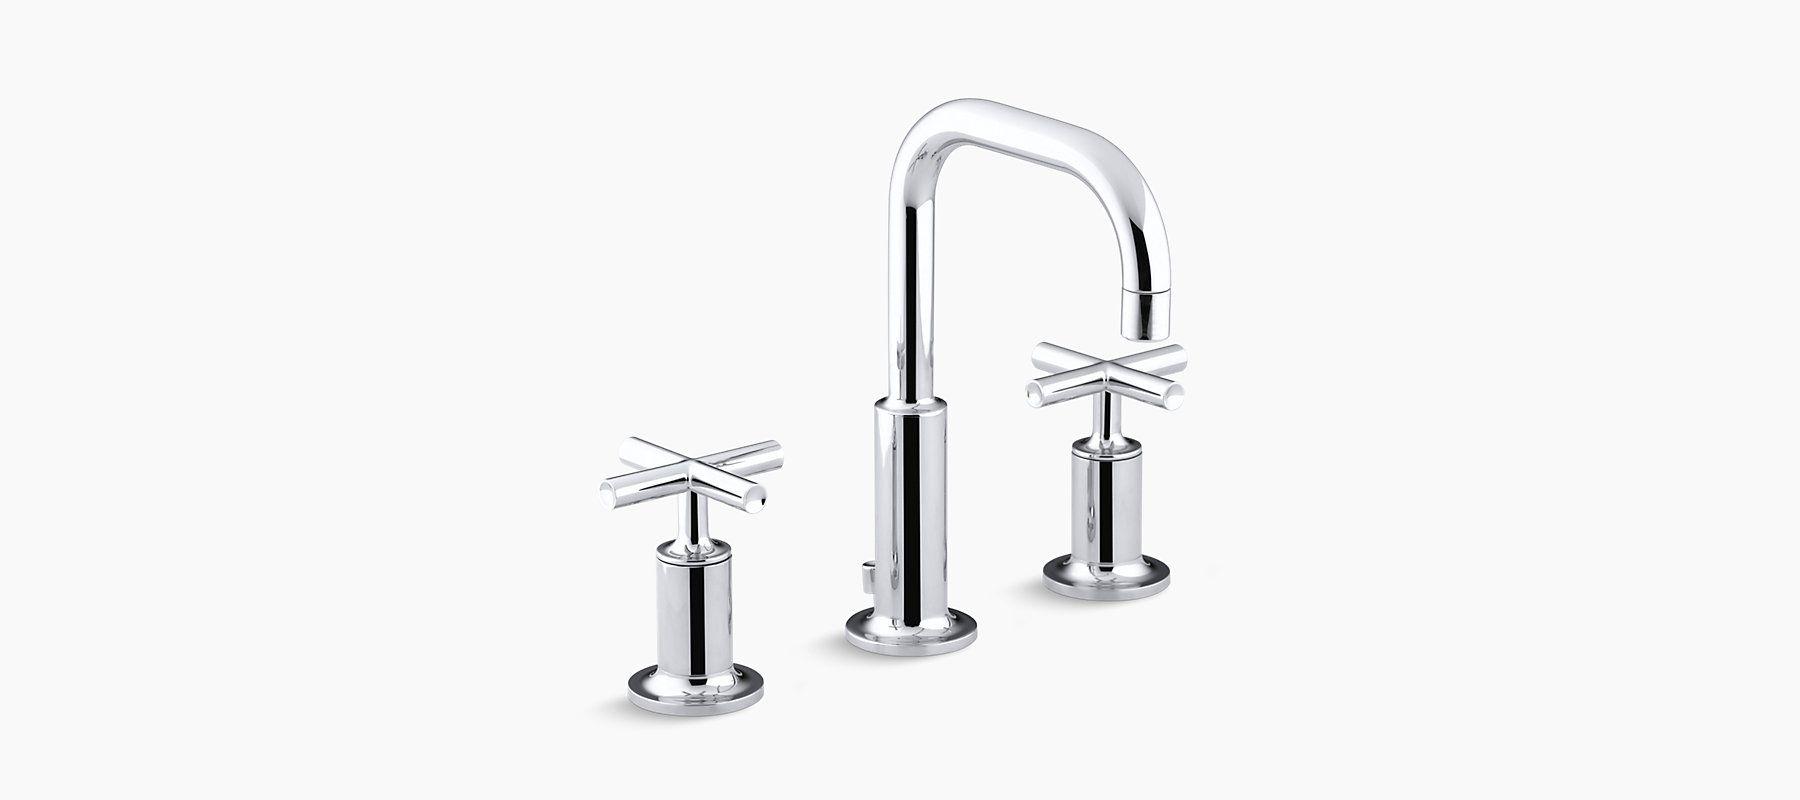 Ada Bathroom Sinks Ada Compliance American Disability Act Ada